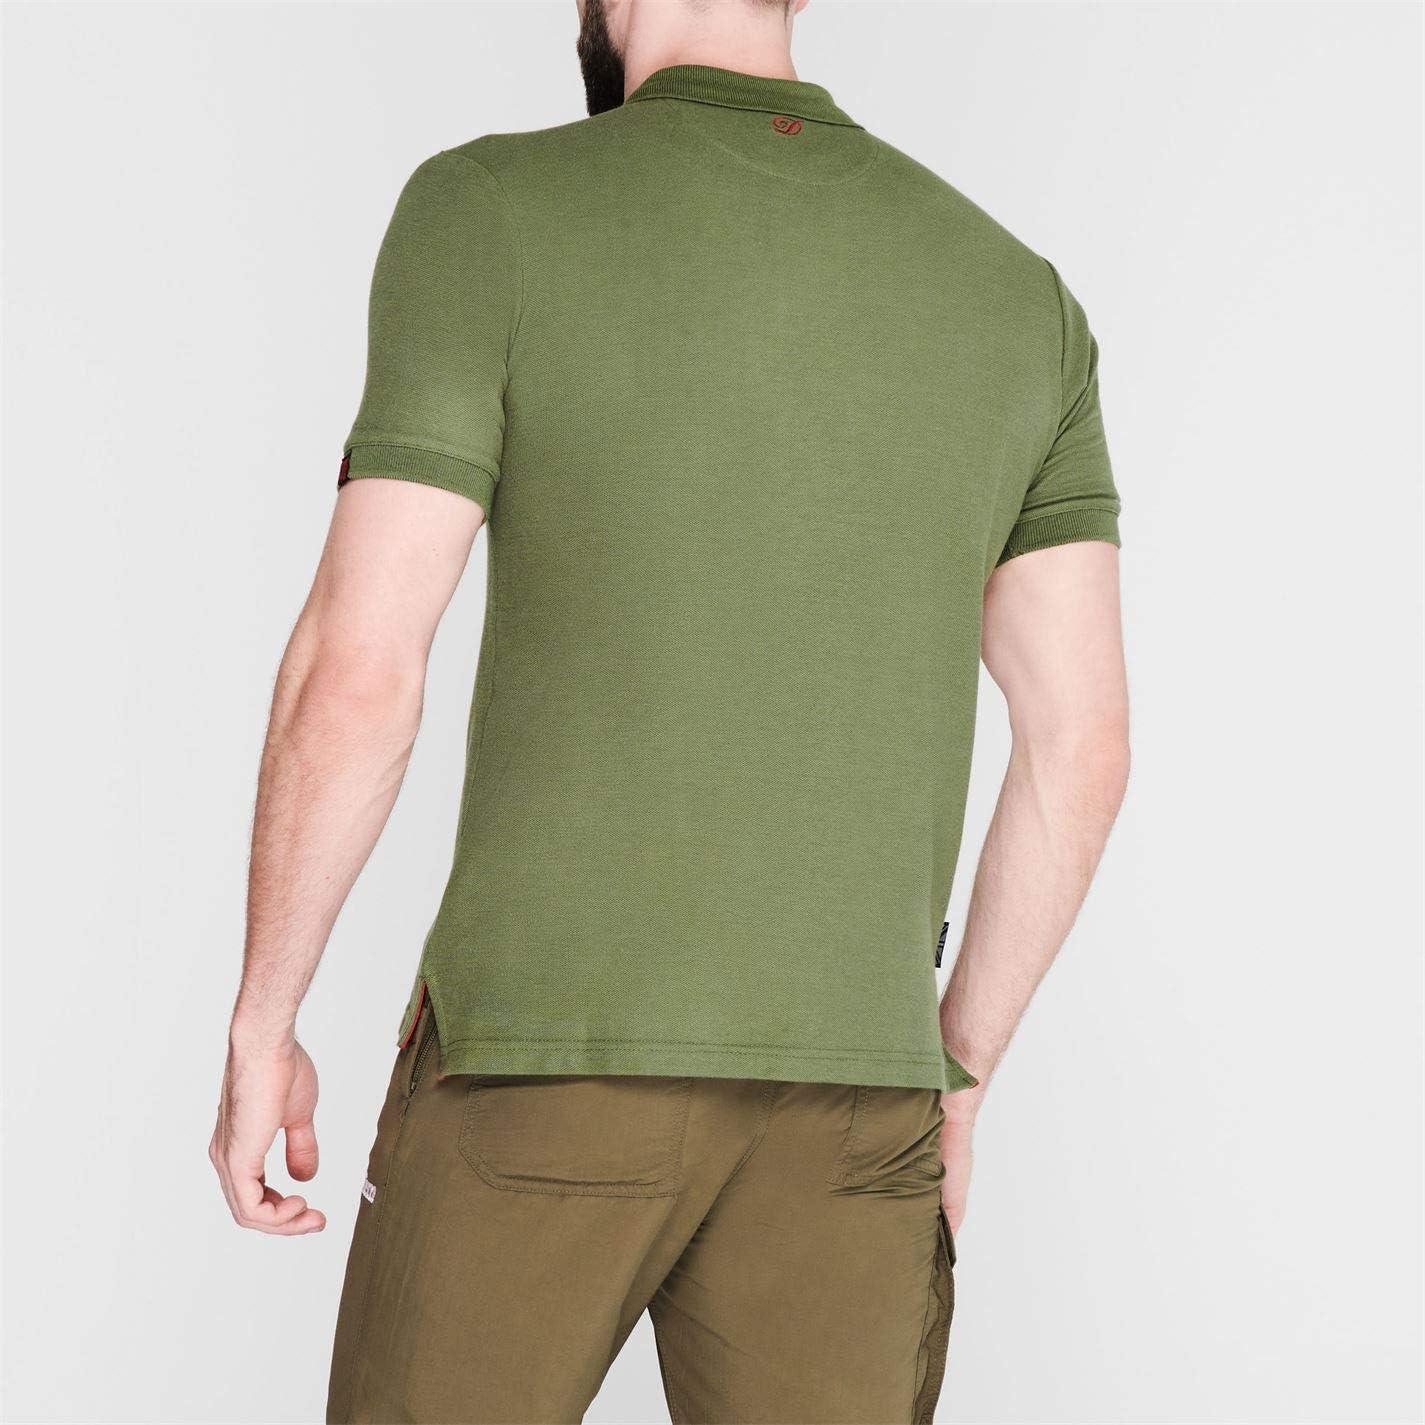 Diem Mens Polo T Shirt Fishing Tee Top Collar Crew Neck Short Sleeve Print